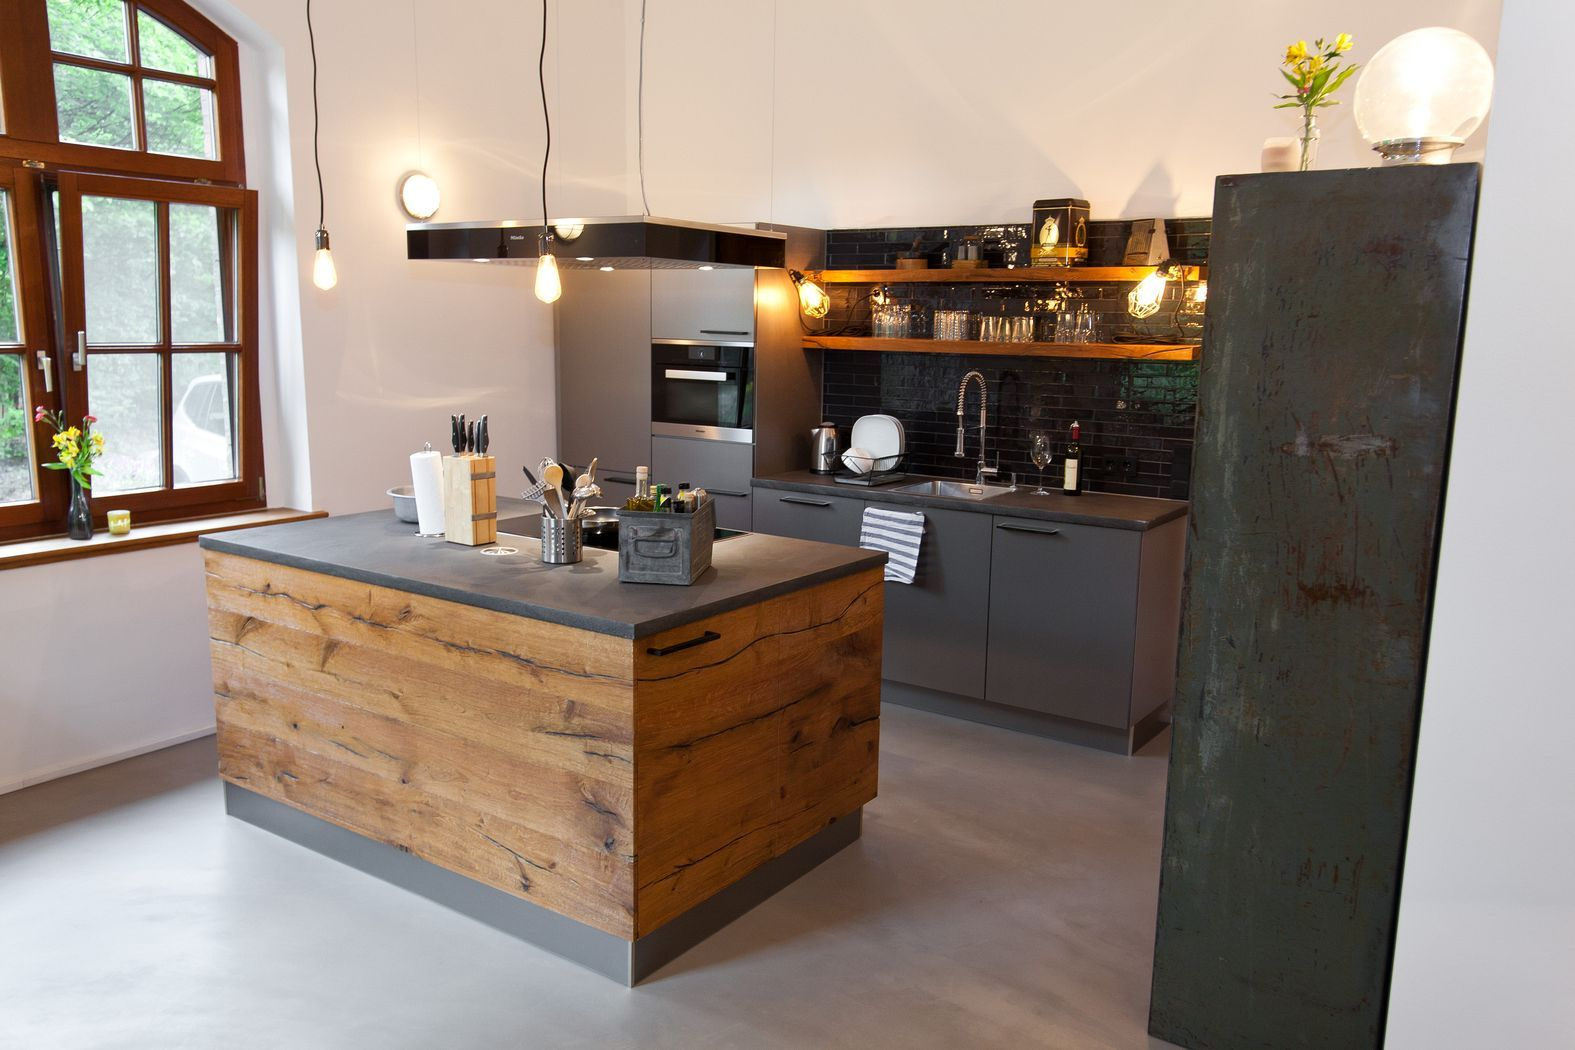 moderner landhausstil k che kuche modern weiss holz landhausstil weis moderne ikea blende. Black Bedroom Furniture Sets. Home Design Ideas